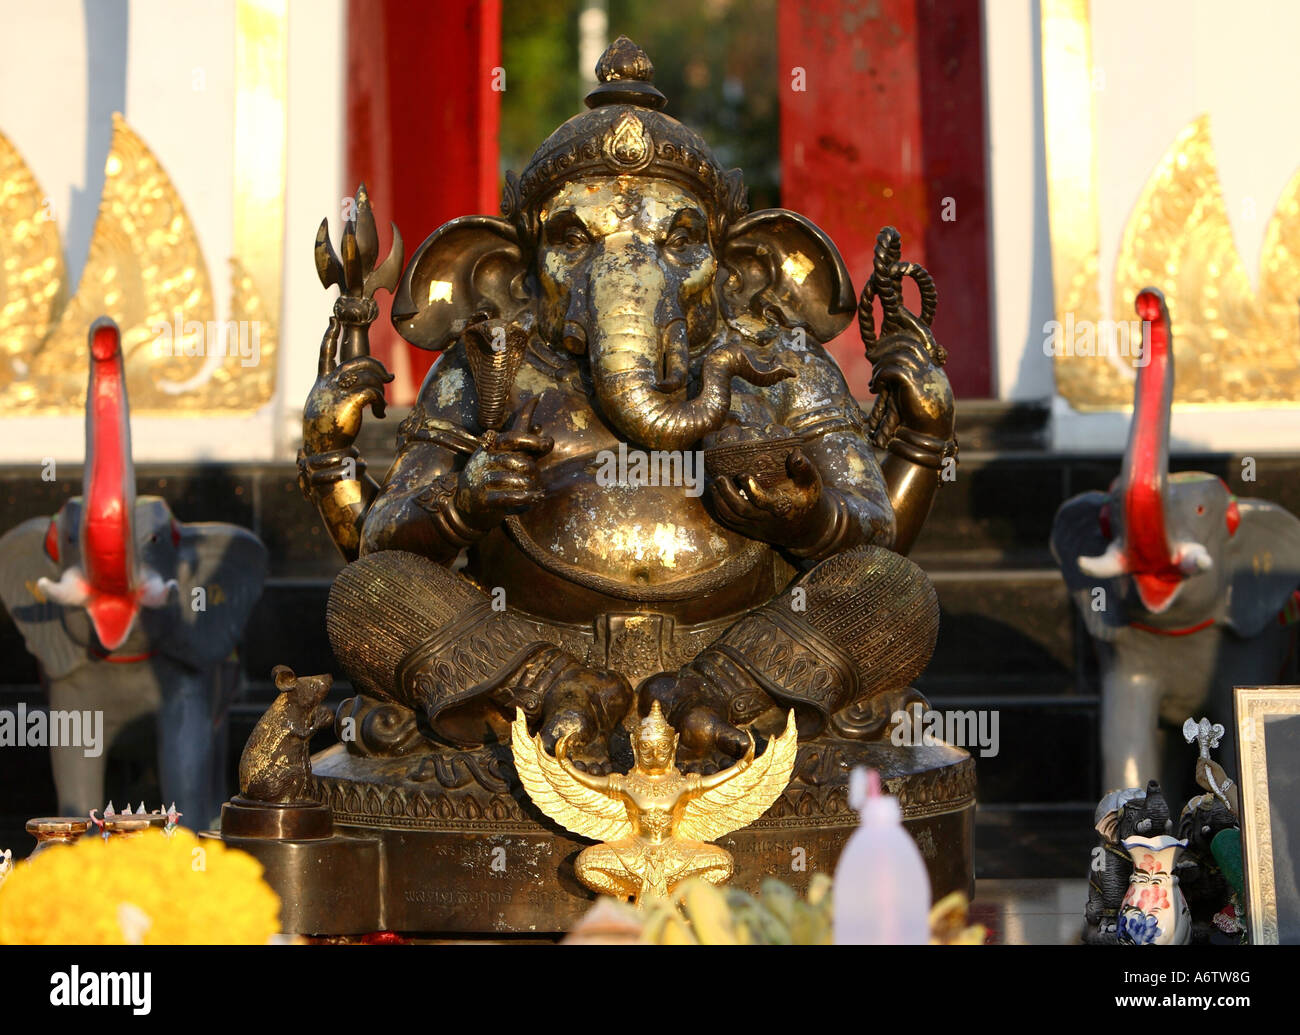 Ganesha figure inside a temple of Sanam Chandra Palace Park in Nakhon Pathom, Thailand, Asia Stock Photo